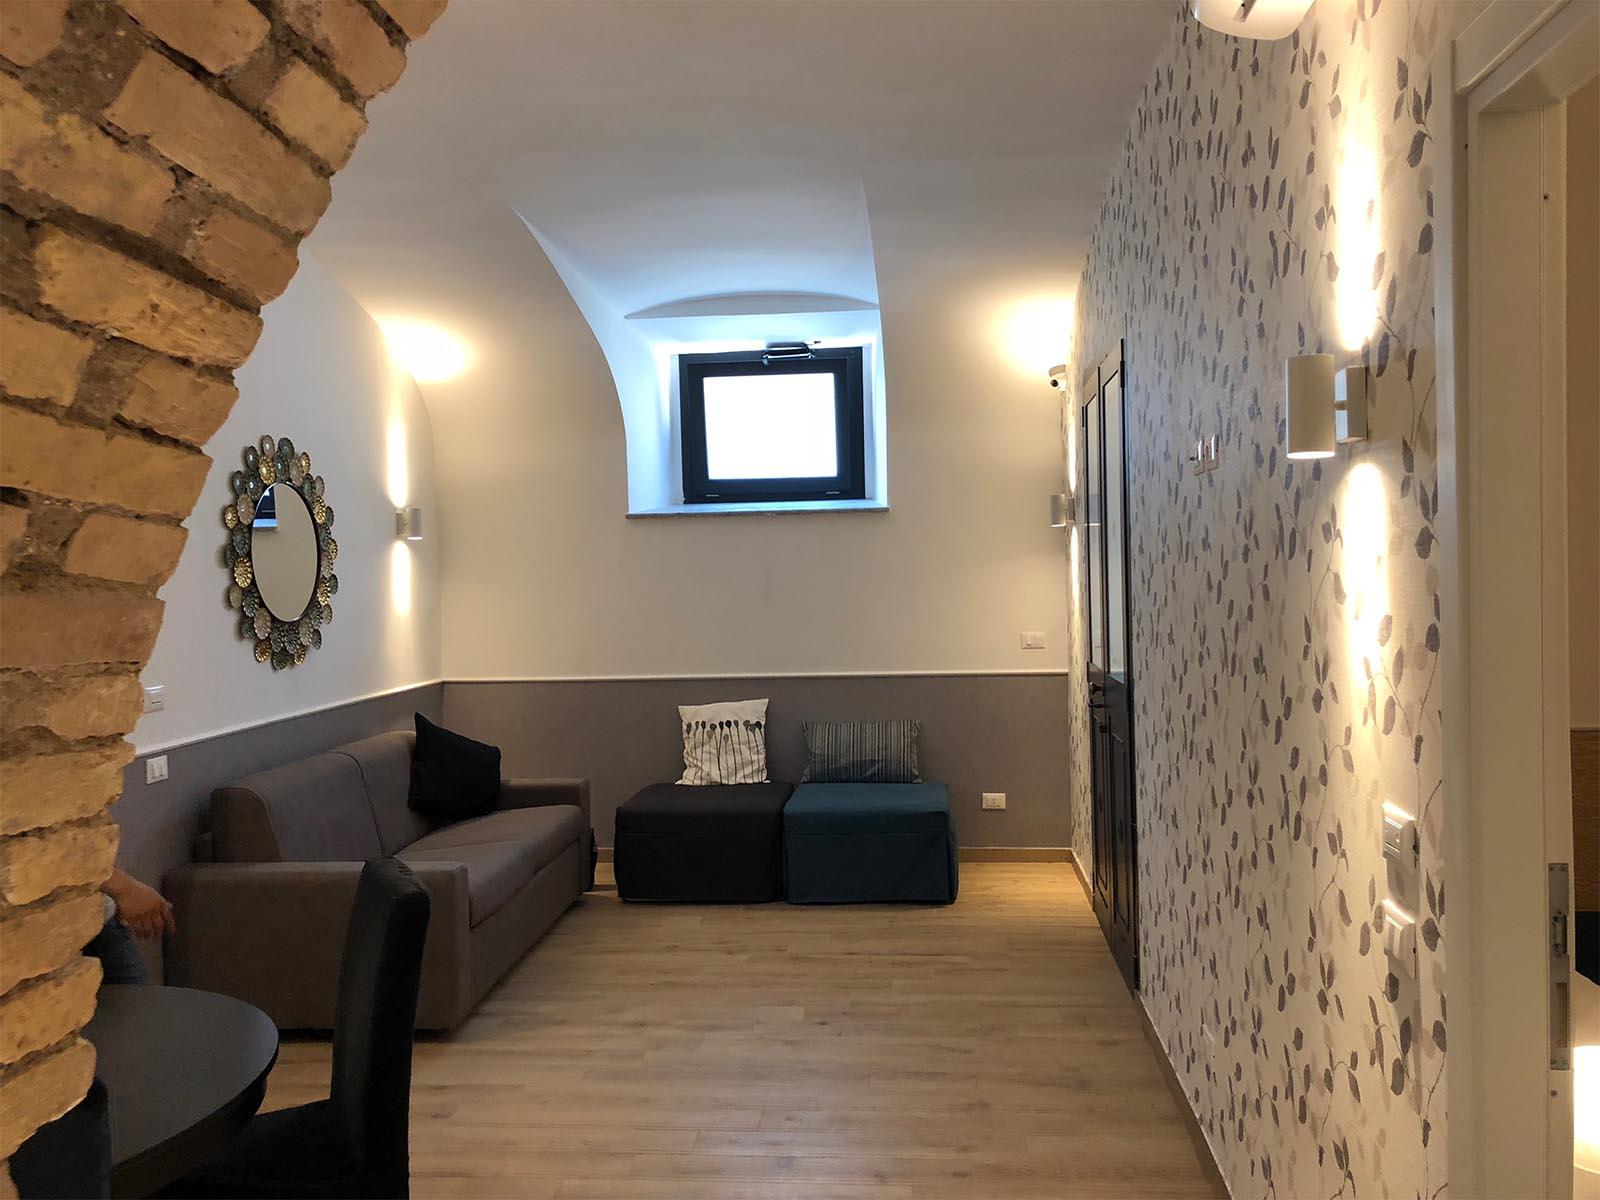 Giolitti Suite Interior 8